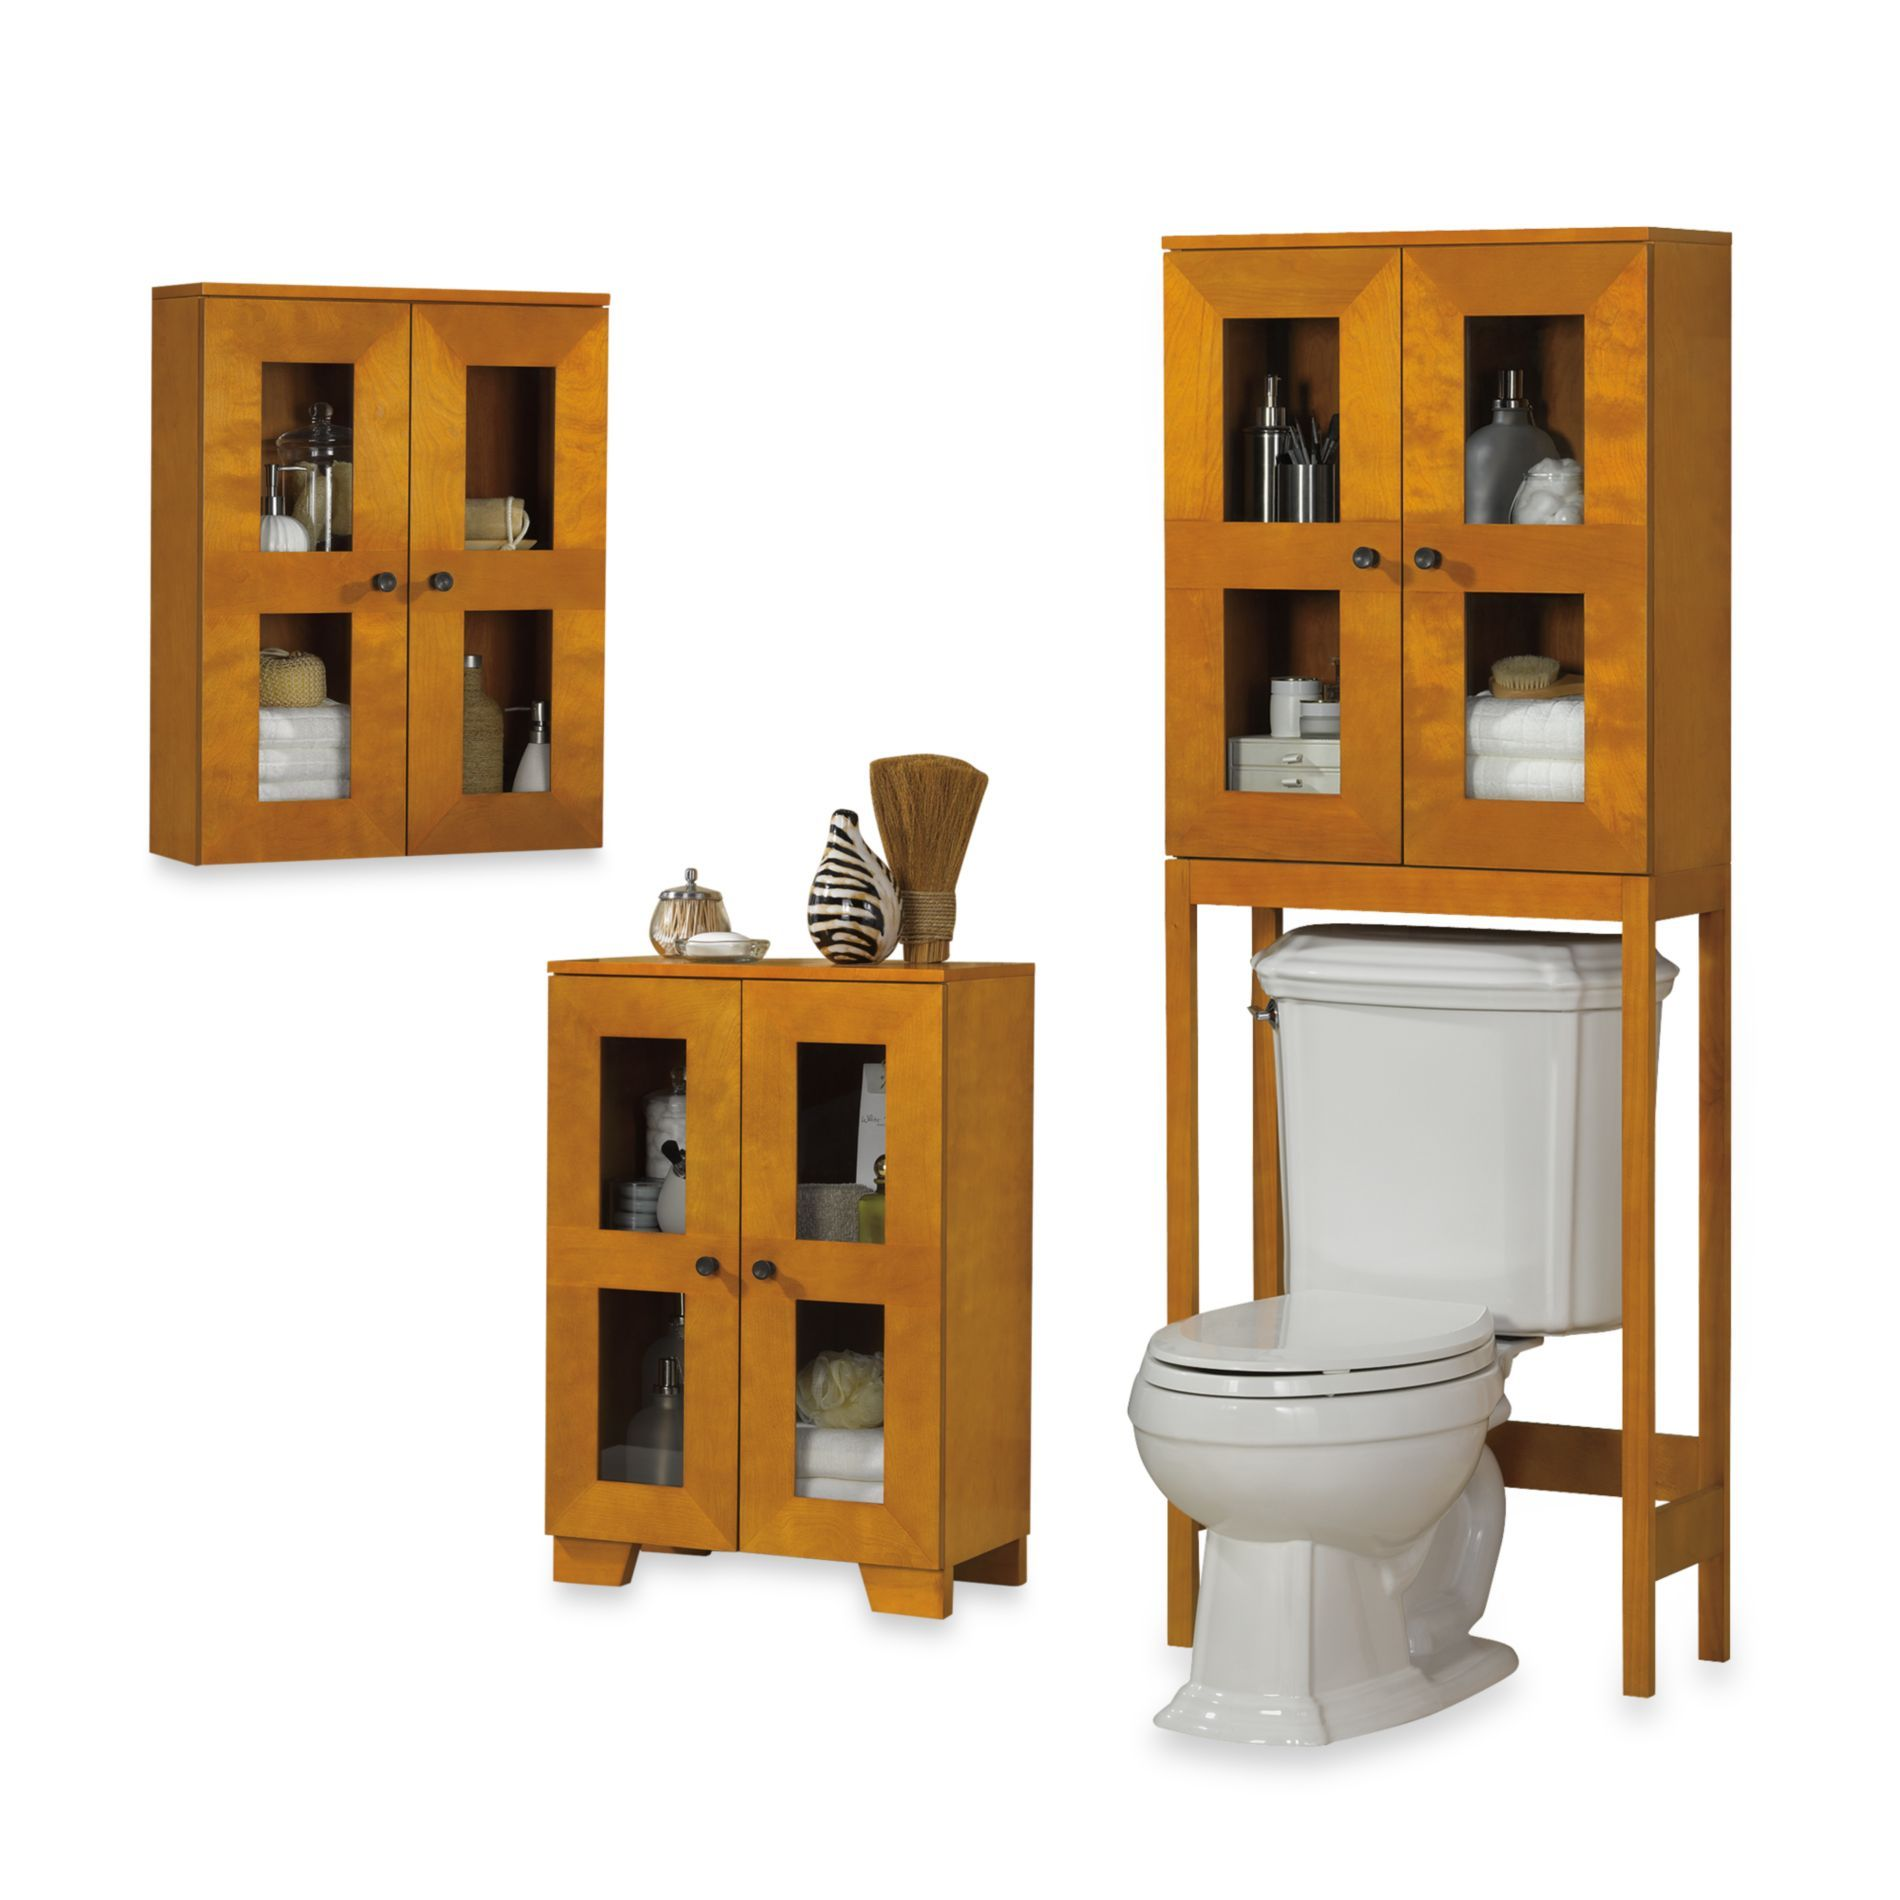 B Smith Somerset Light Walnut Space Saving Cabinets Bedbathandbeyond Com Cabinet Bed Space Saving Bed Bath And Beyond